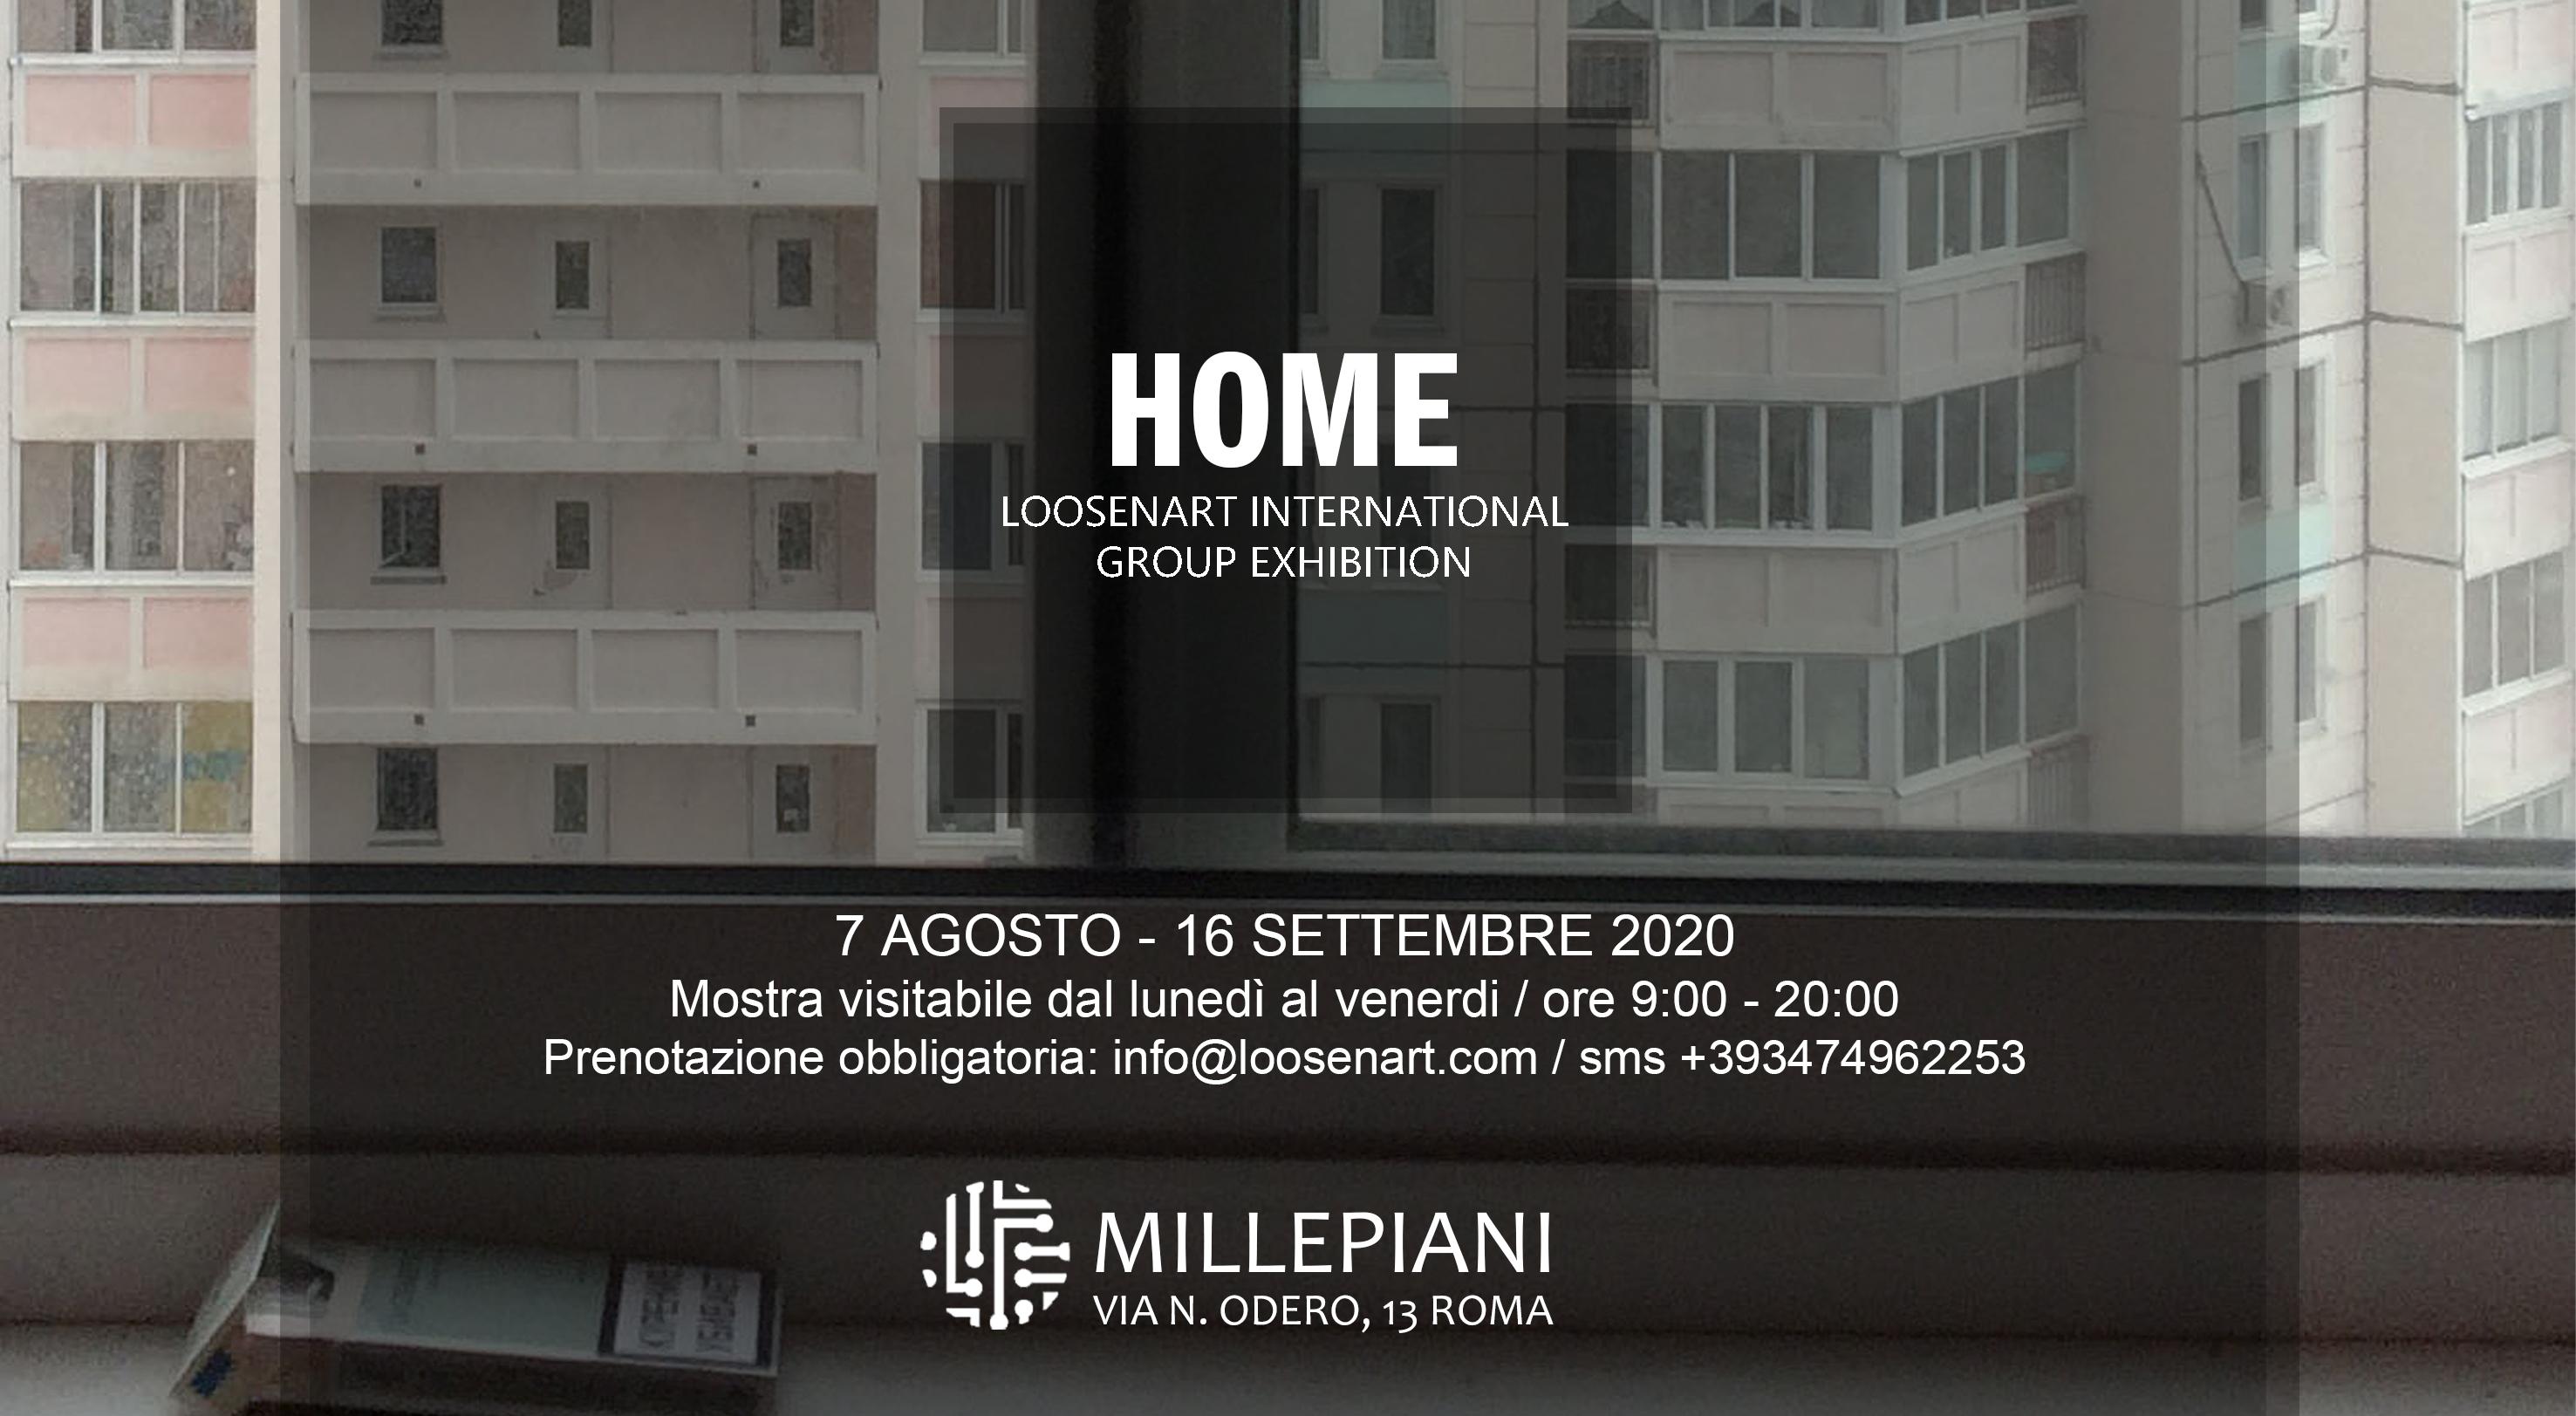 Home wxpo Loosenart Millepiani